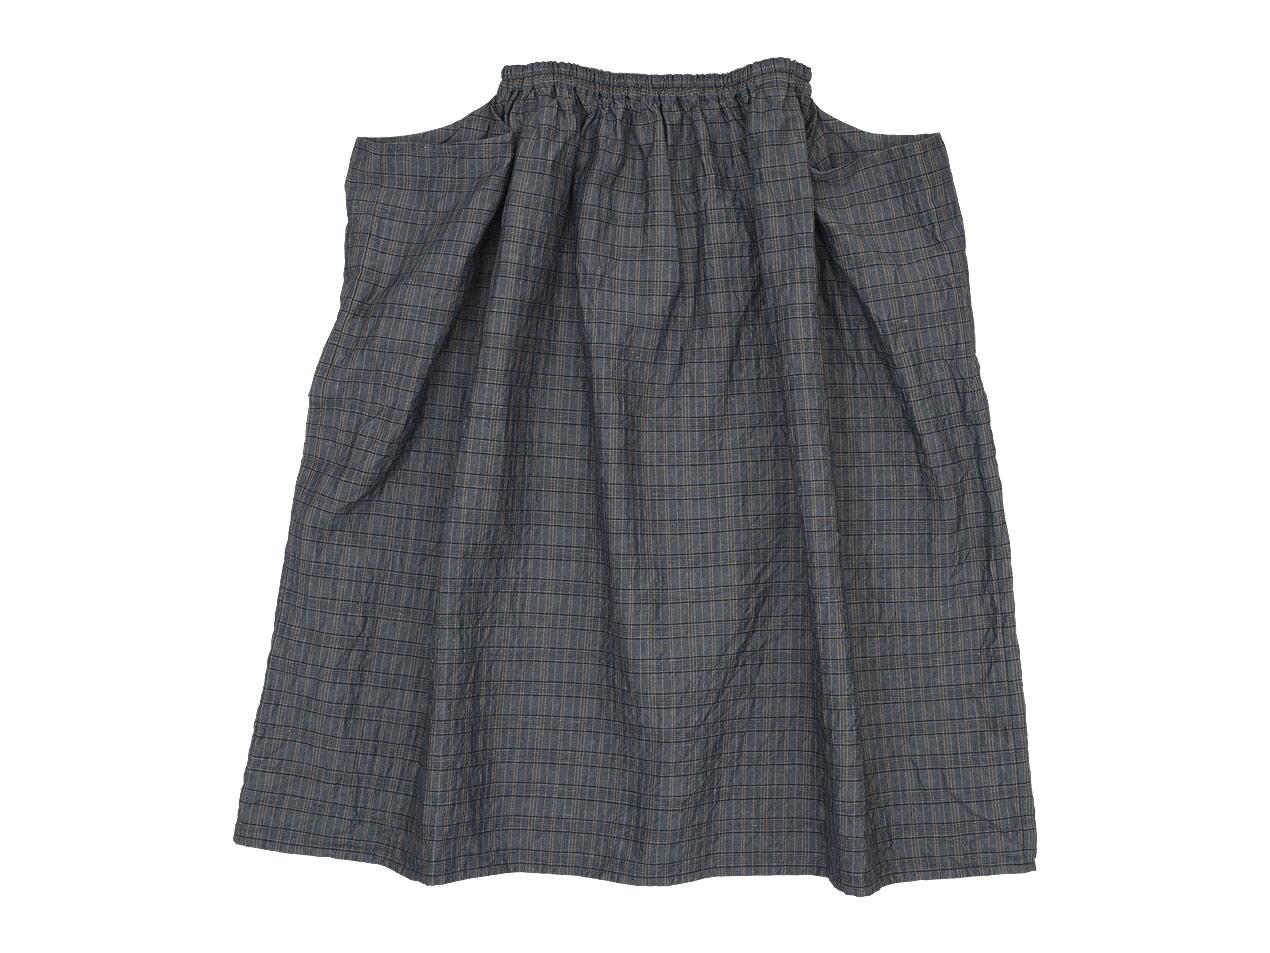 homspun コットンリネンチェック ギャザースカート